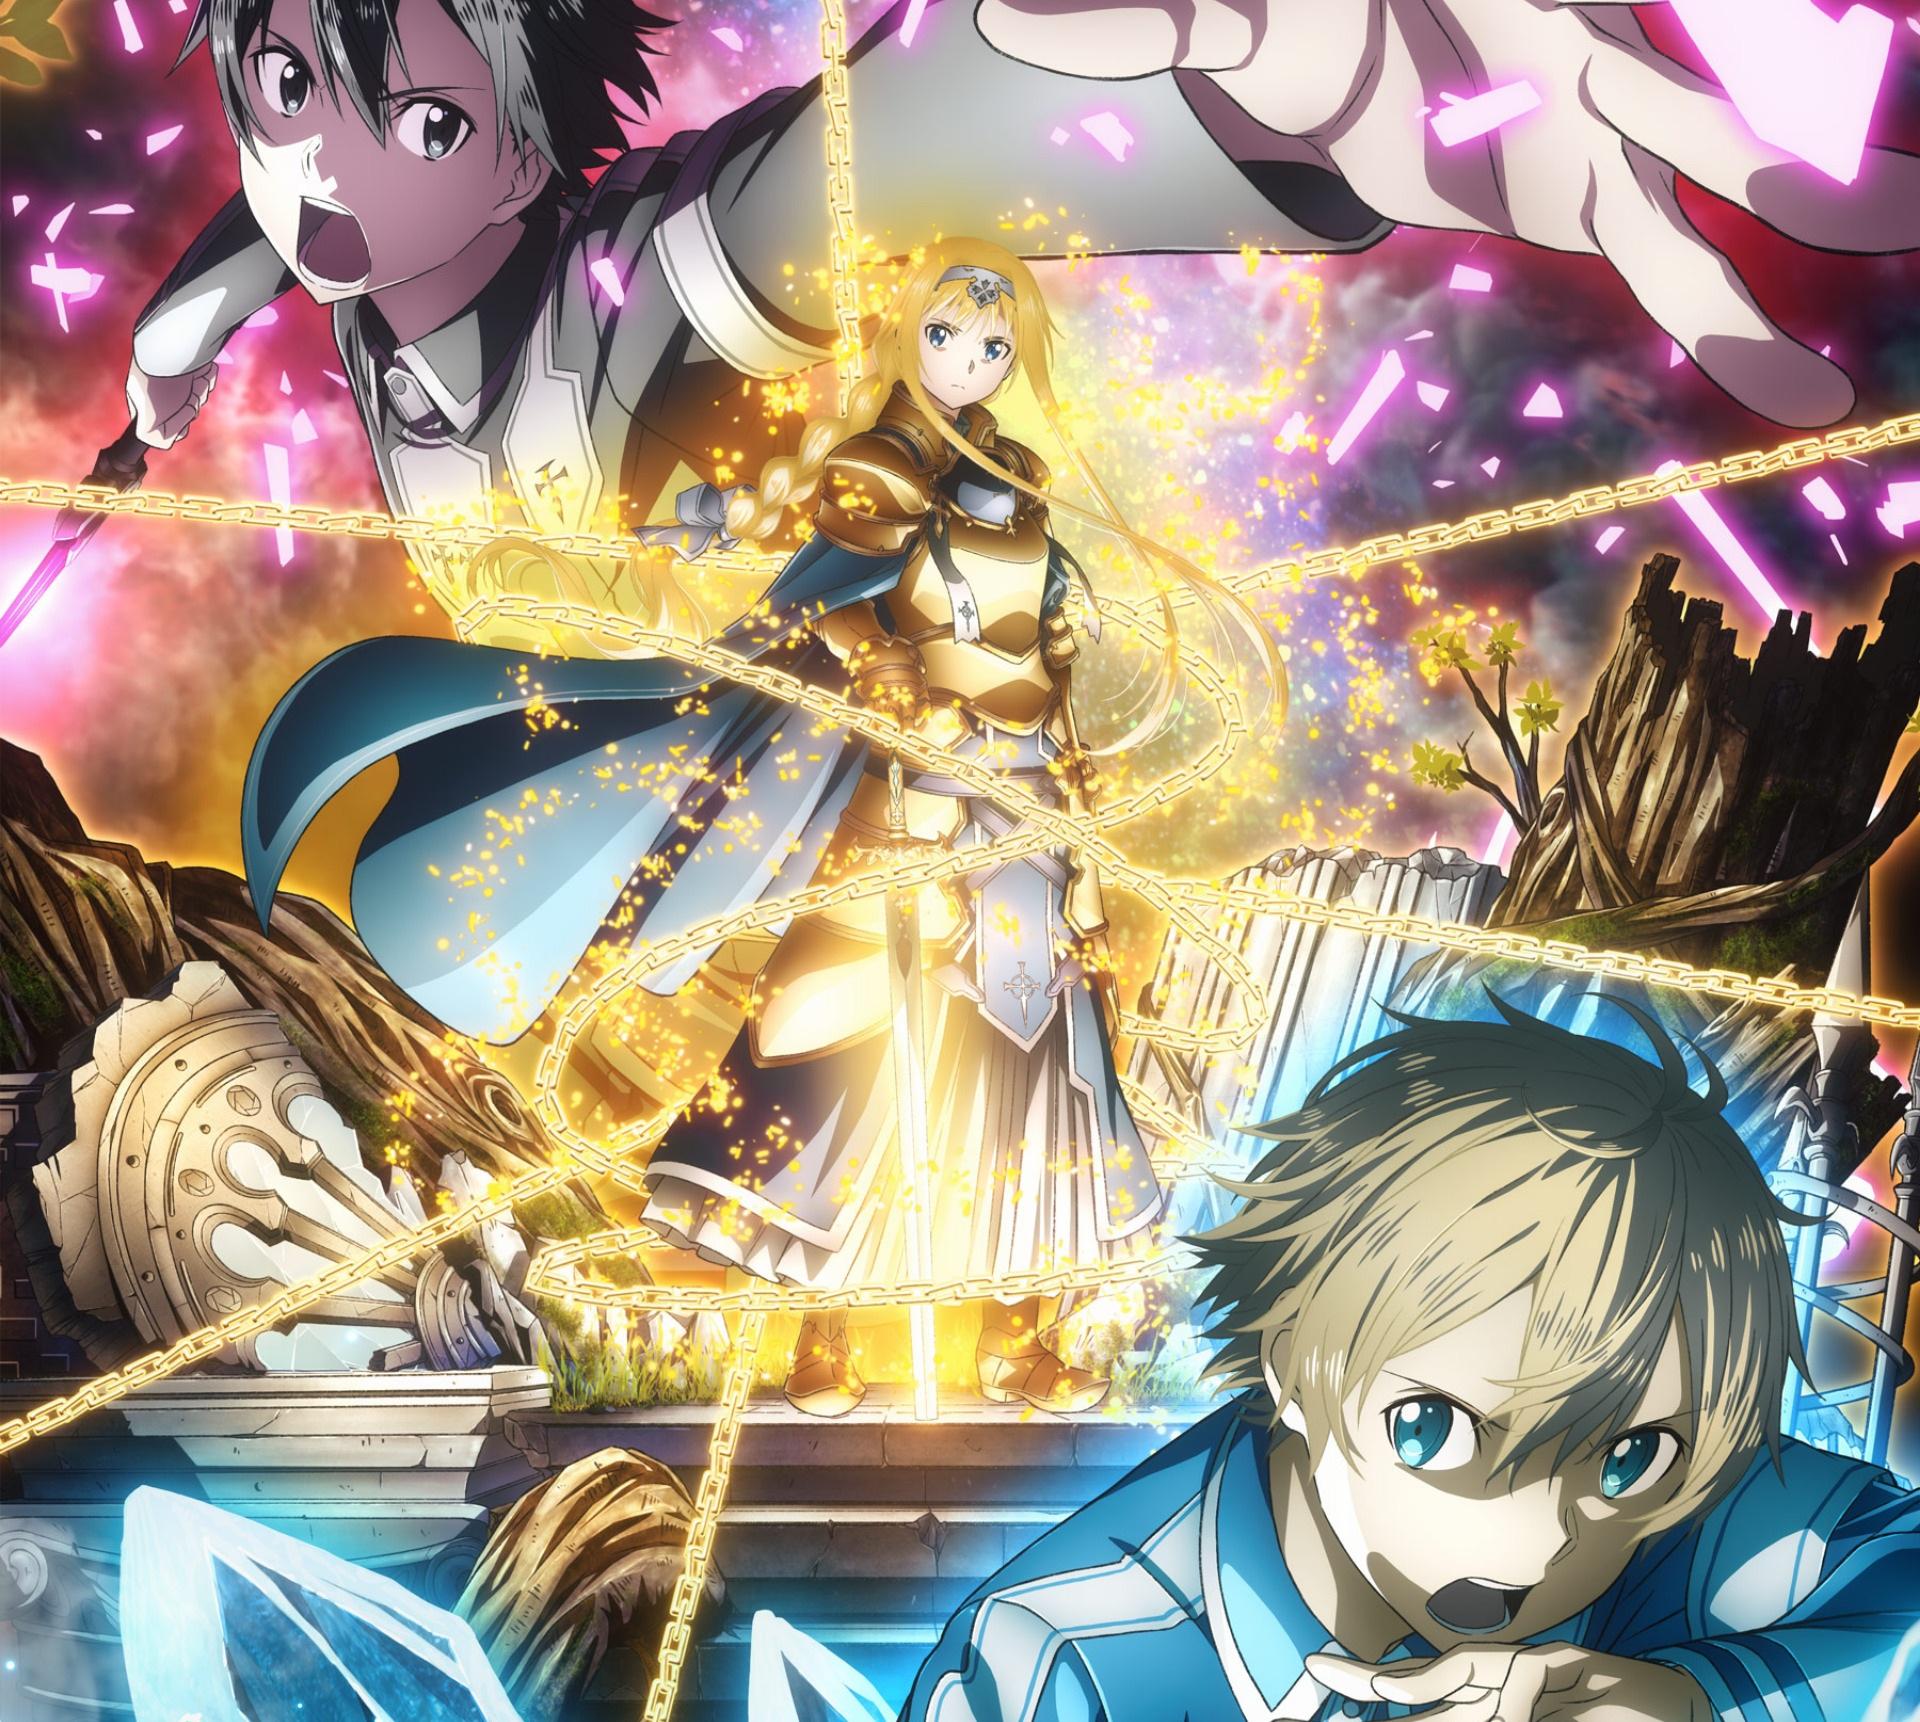 Sword Art Online Alicization Hd Wallpaper Background